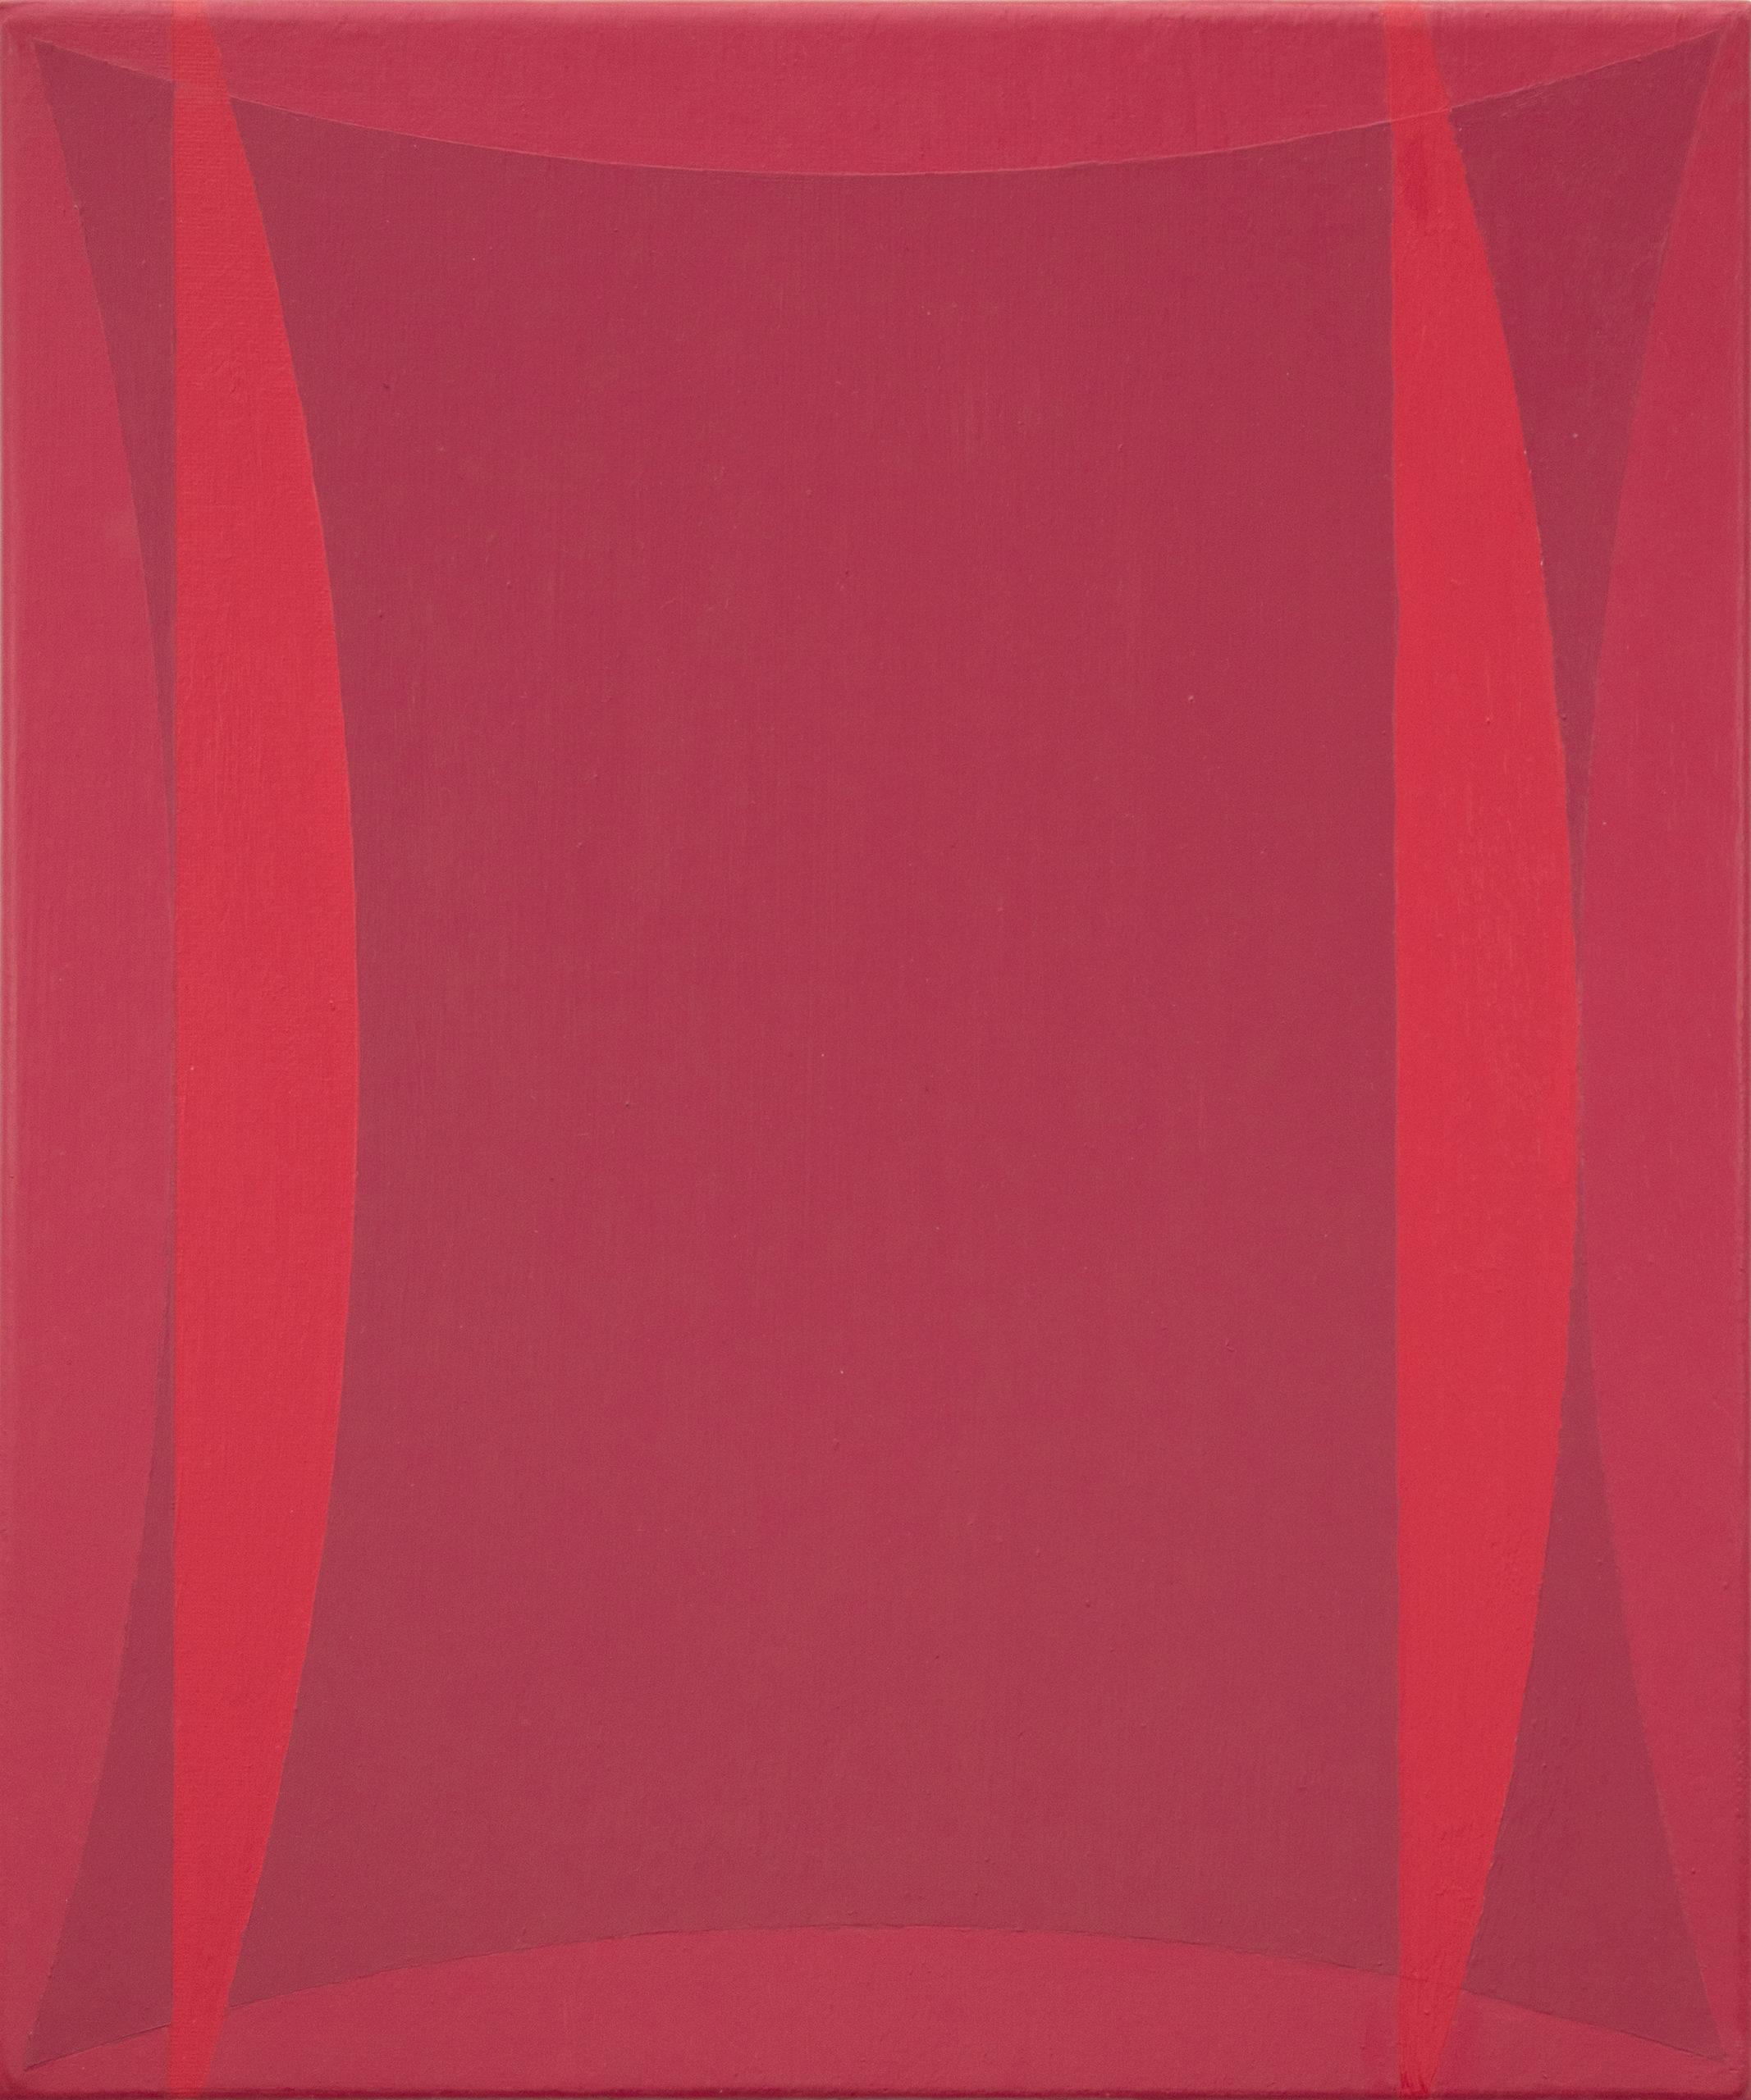 Untitled (Three Reds)